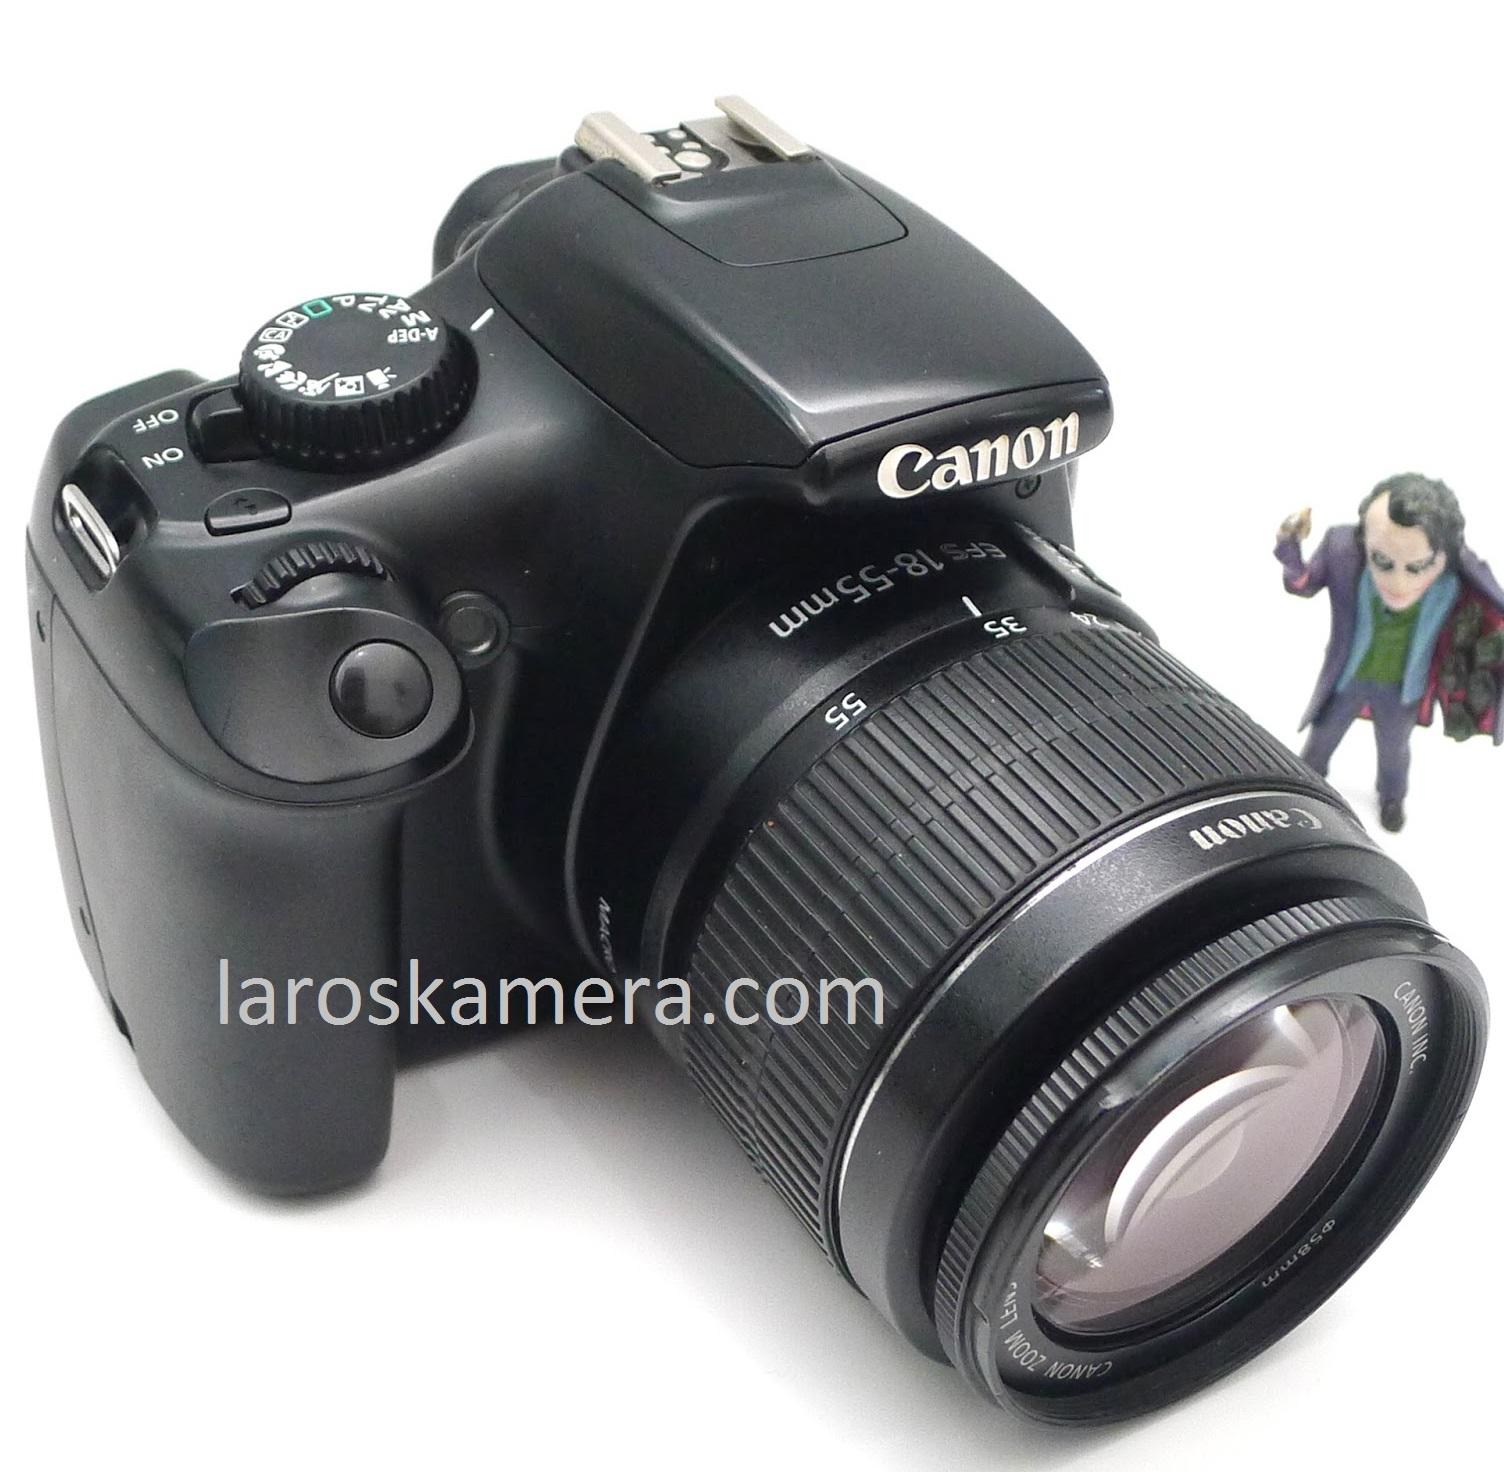 Jual Kamera Dslr Canon Eos 1100d Second Laroskamera Com Jual